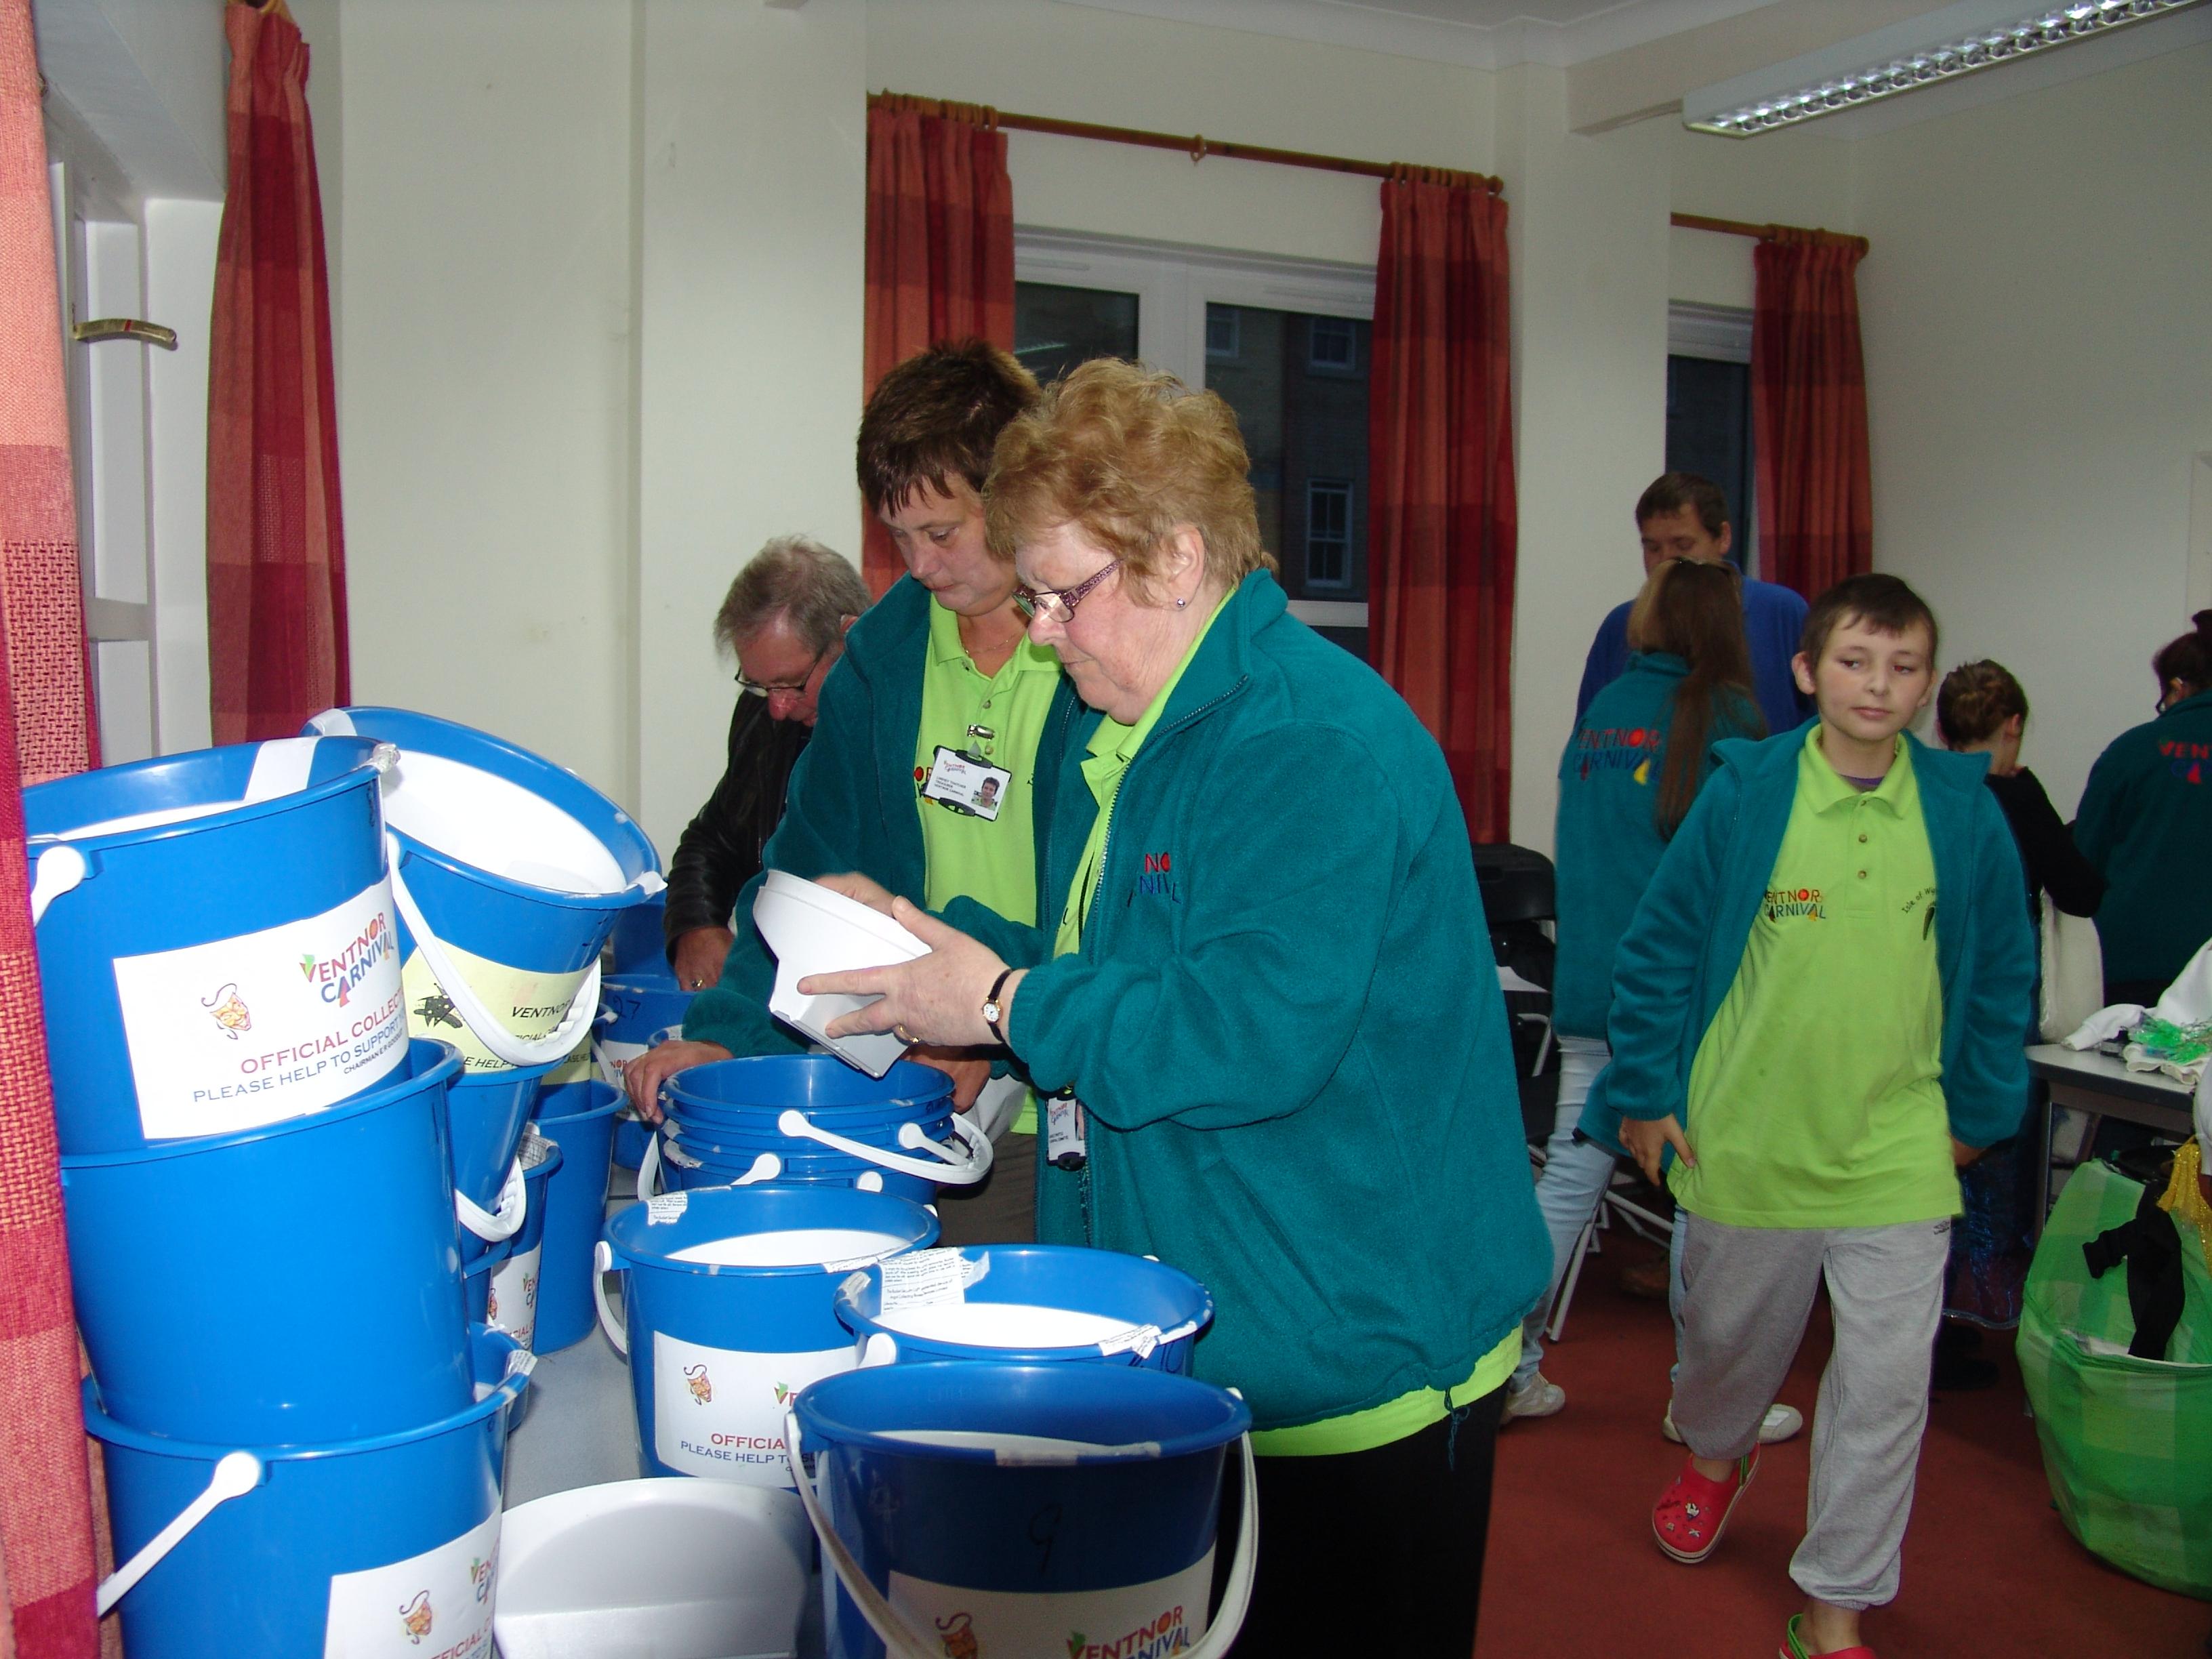 Preparing buckets